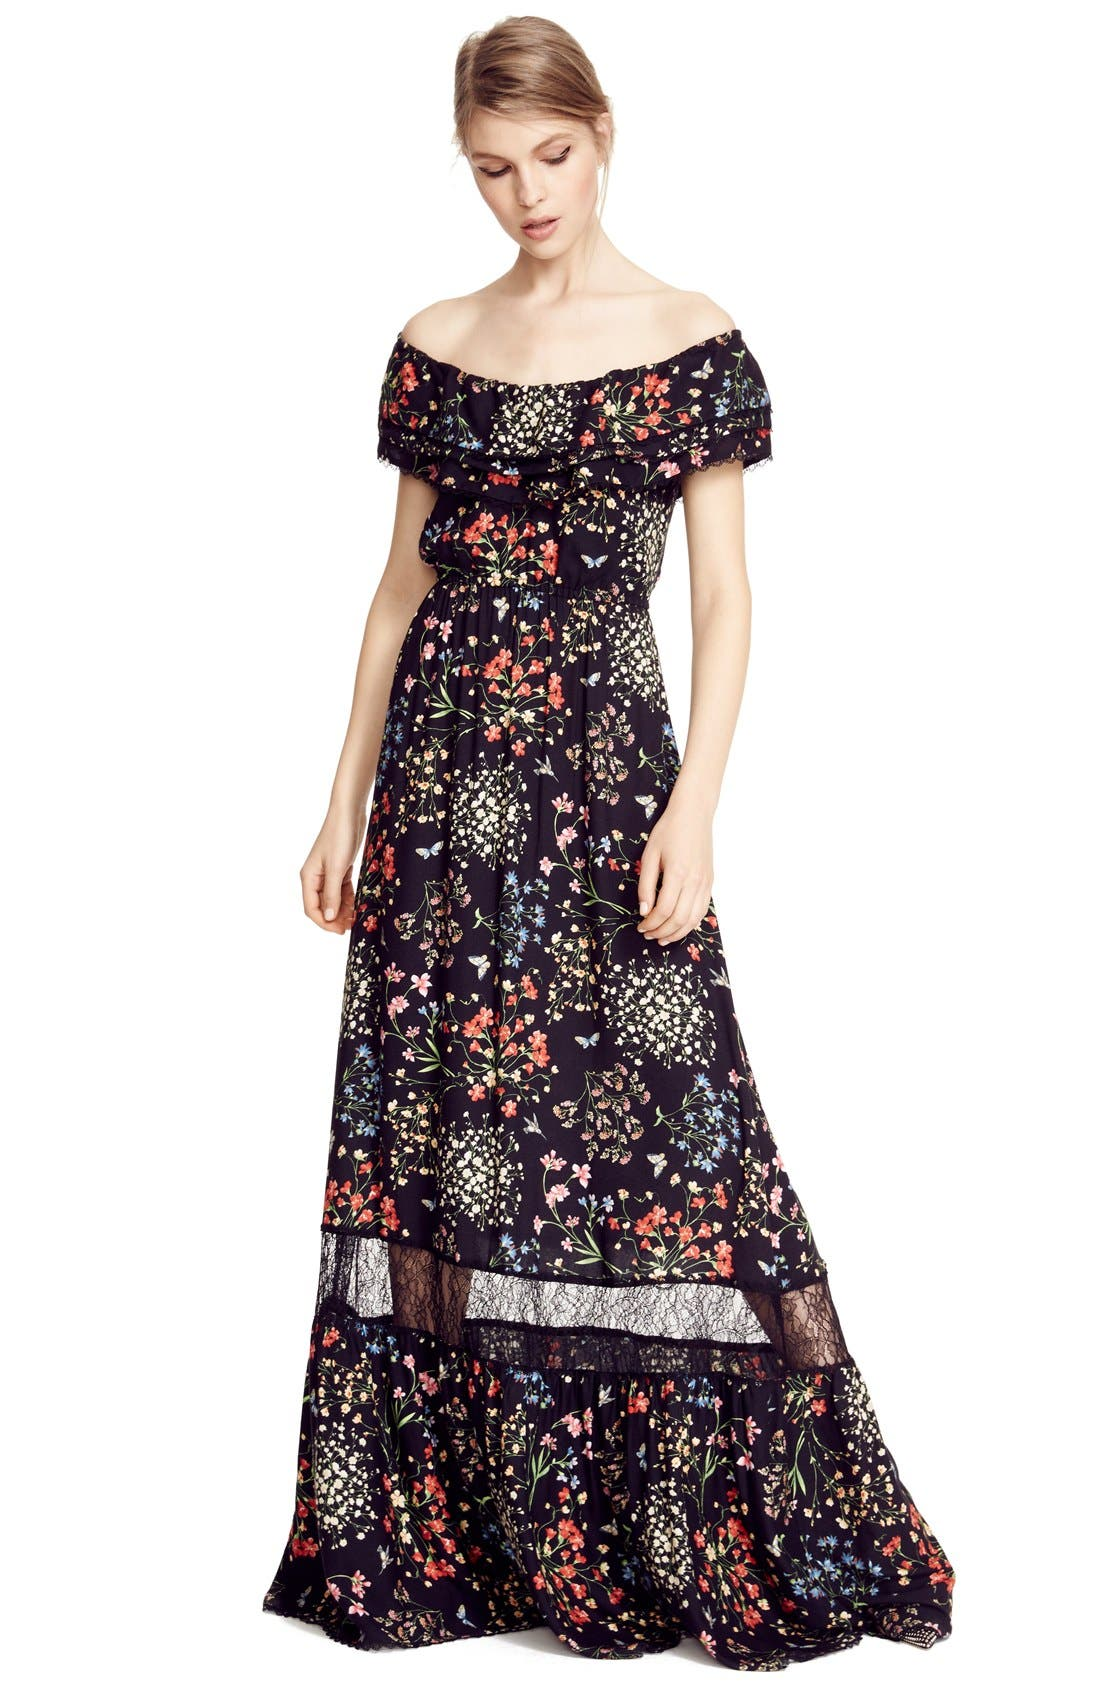 'Cheri' Floral Print Off the Shoulder Maxi Dress,                             Alternate thumbnail 4, color,                             002